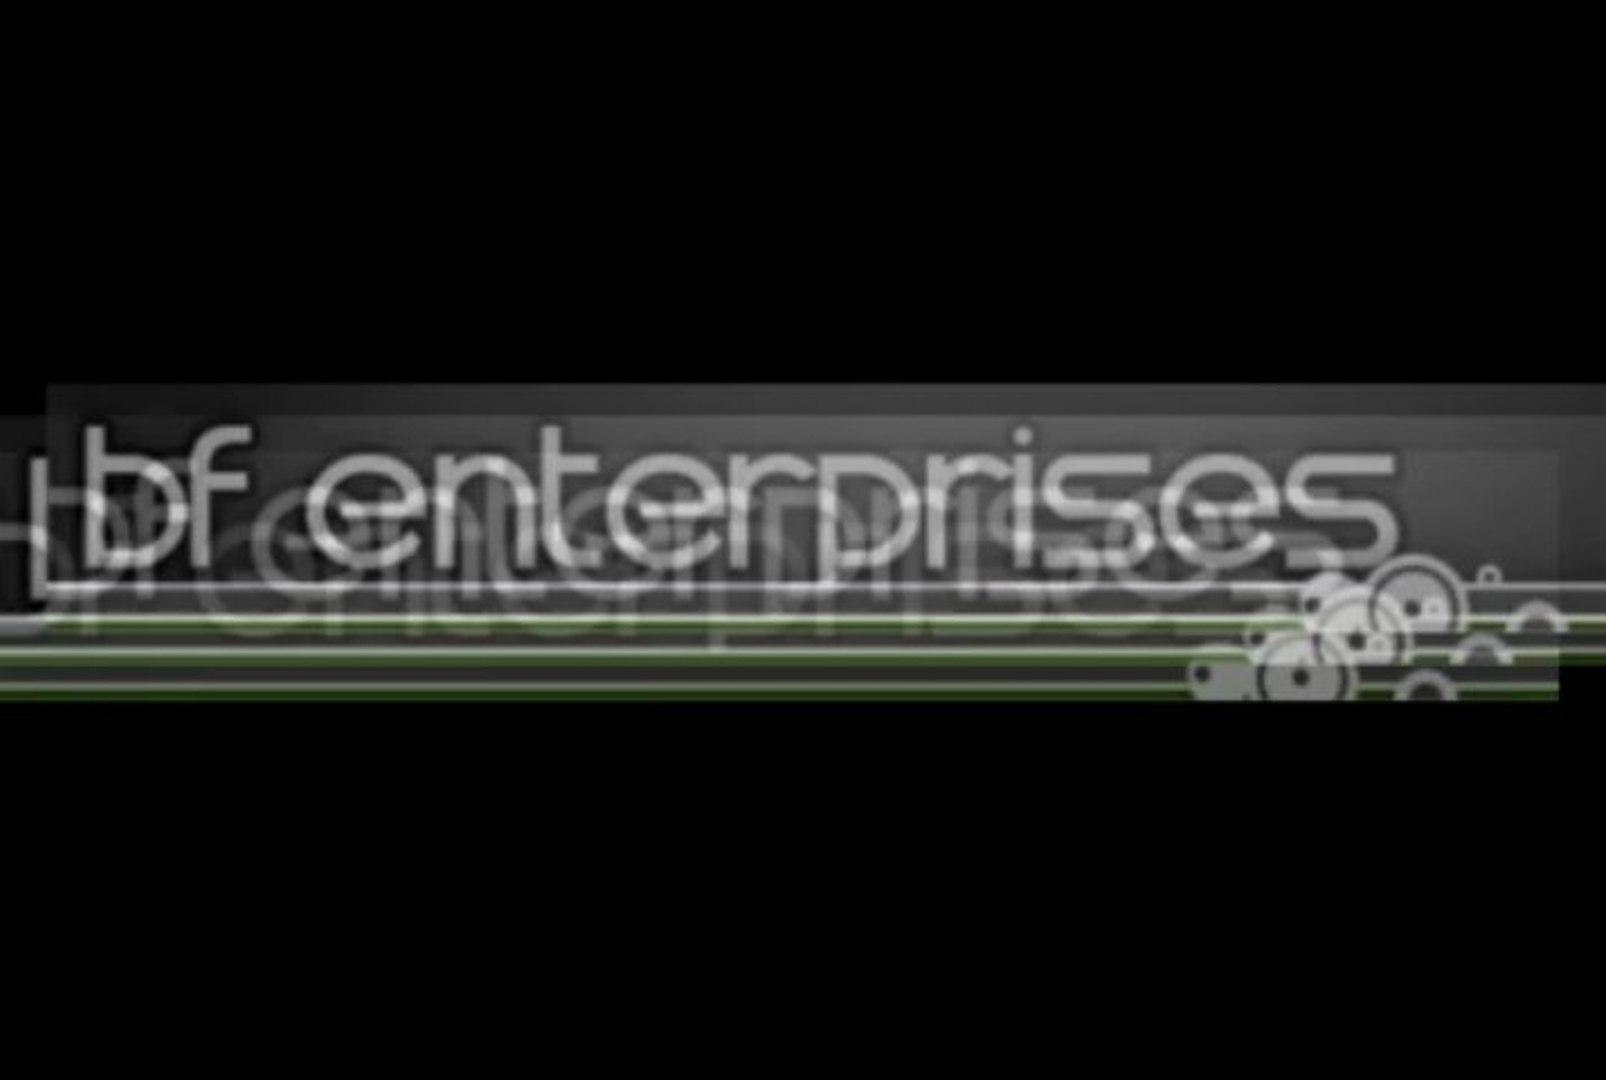 Website Design Boston, SEO Services Boston, Web Design Taunton - Bfenterprises.biz